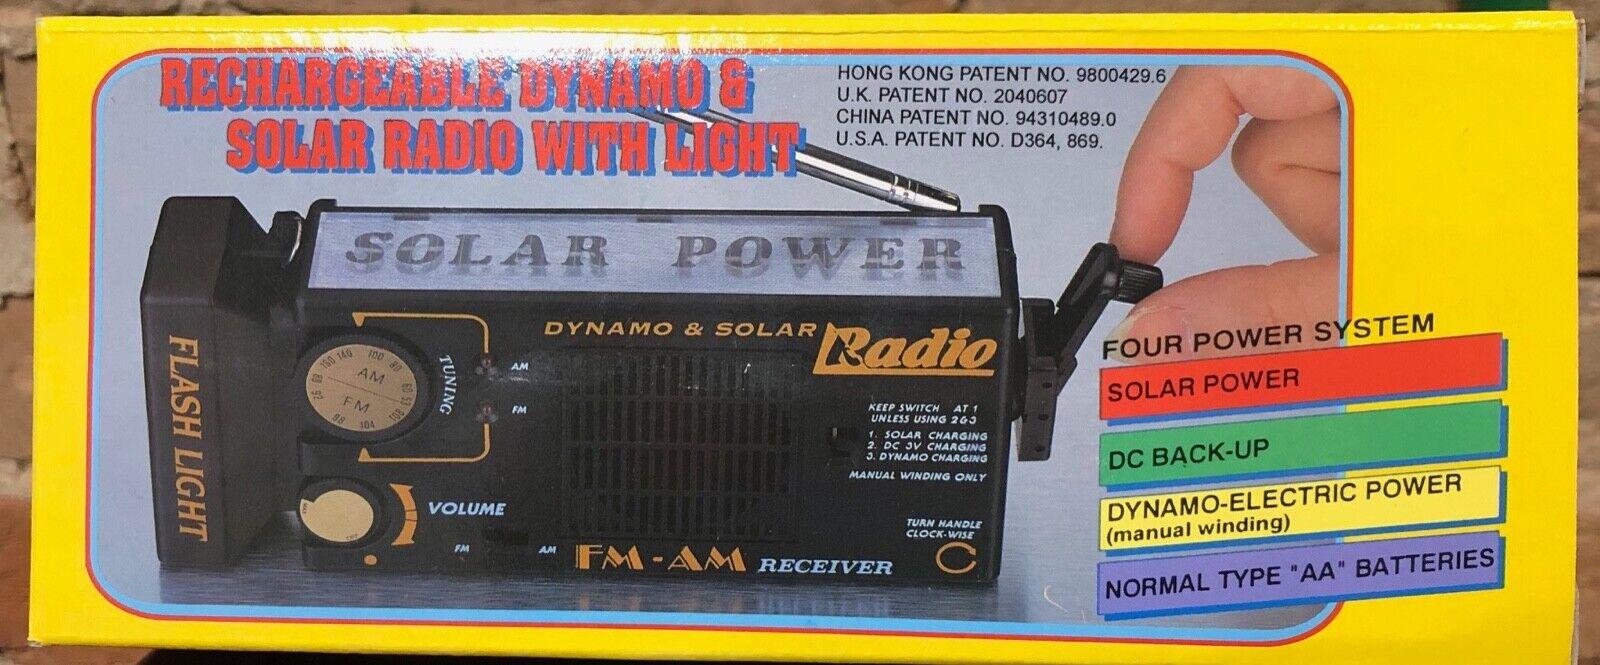 Portable Solar Power Radio, Flashlight, AA Battery and Hand